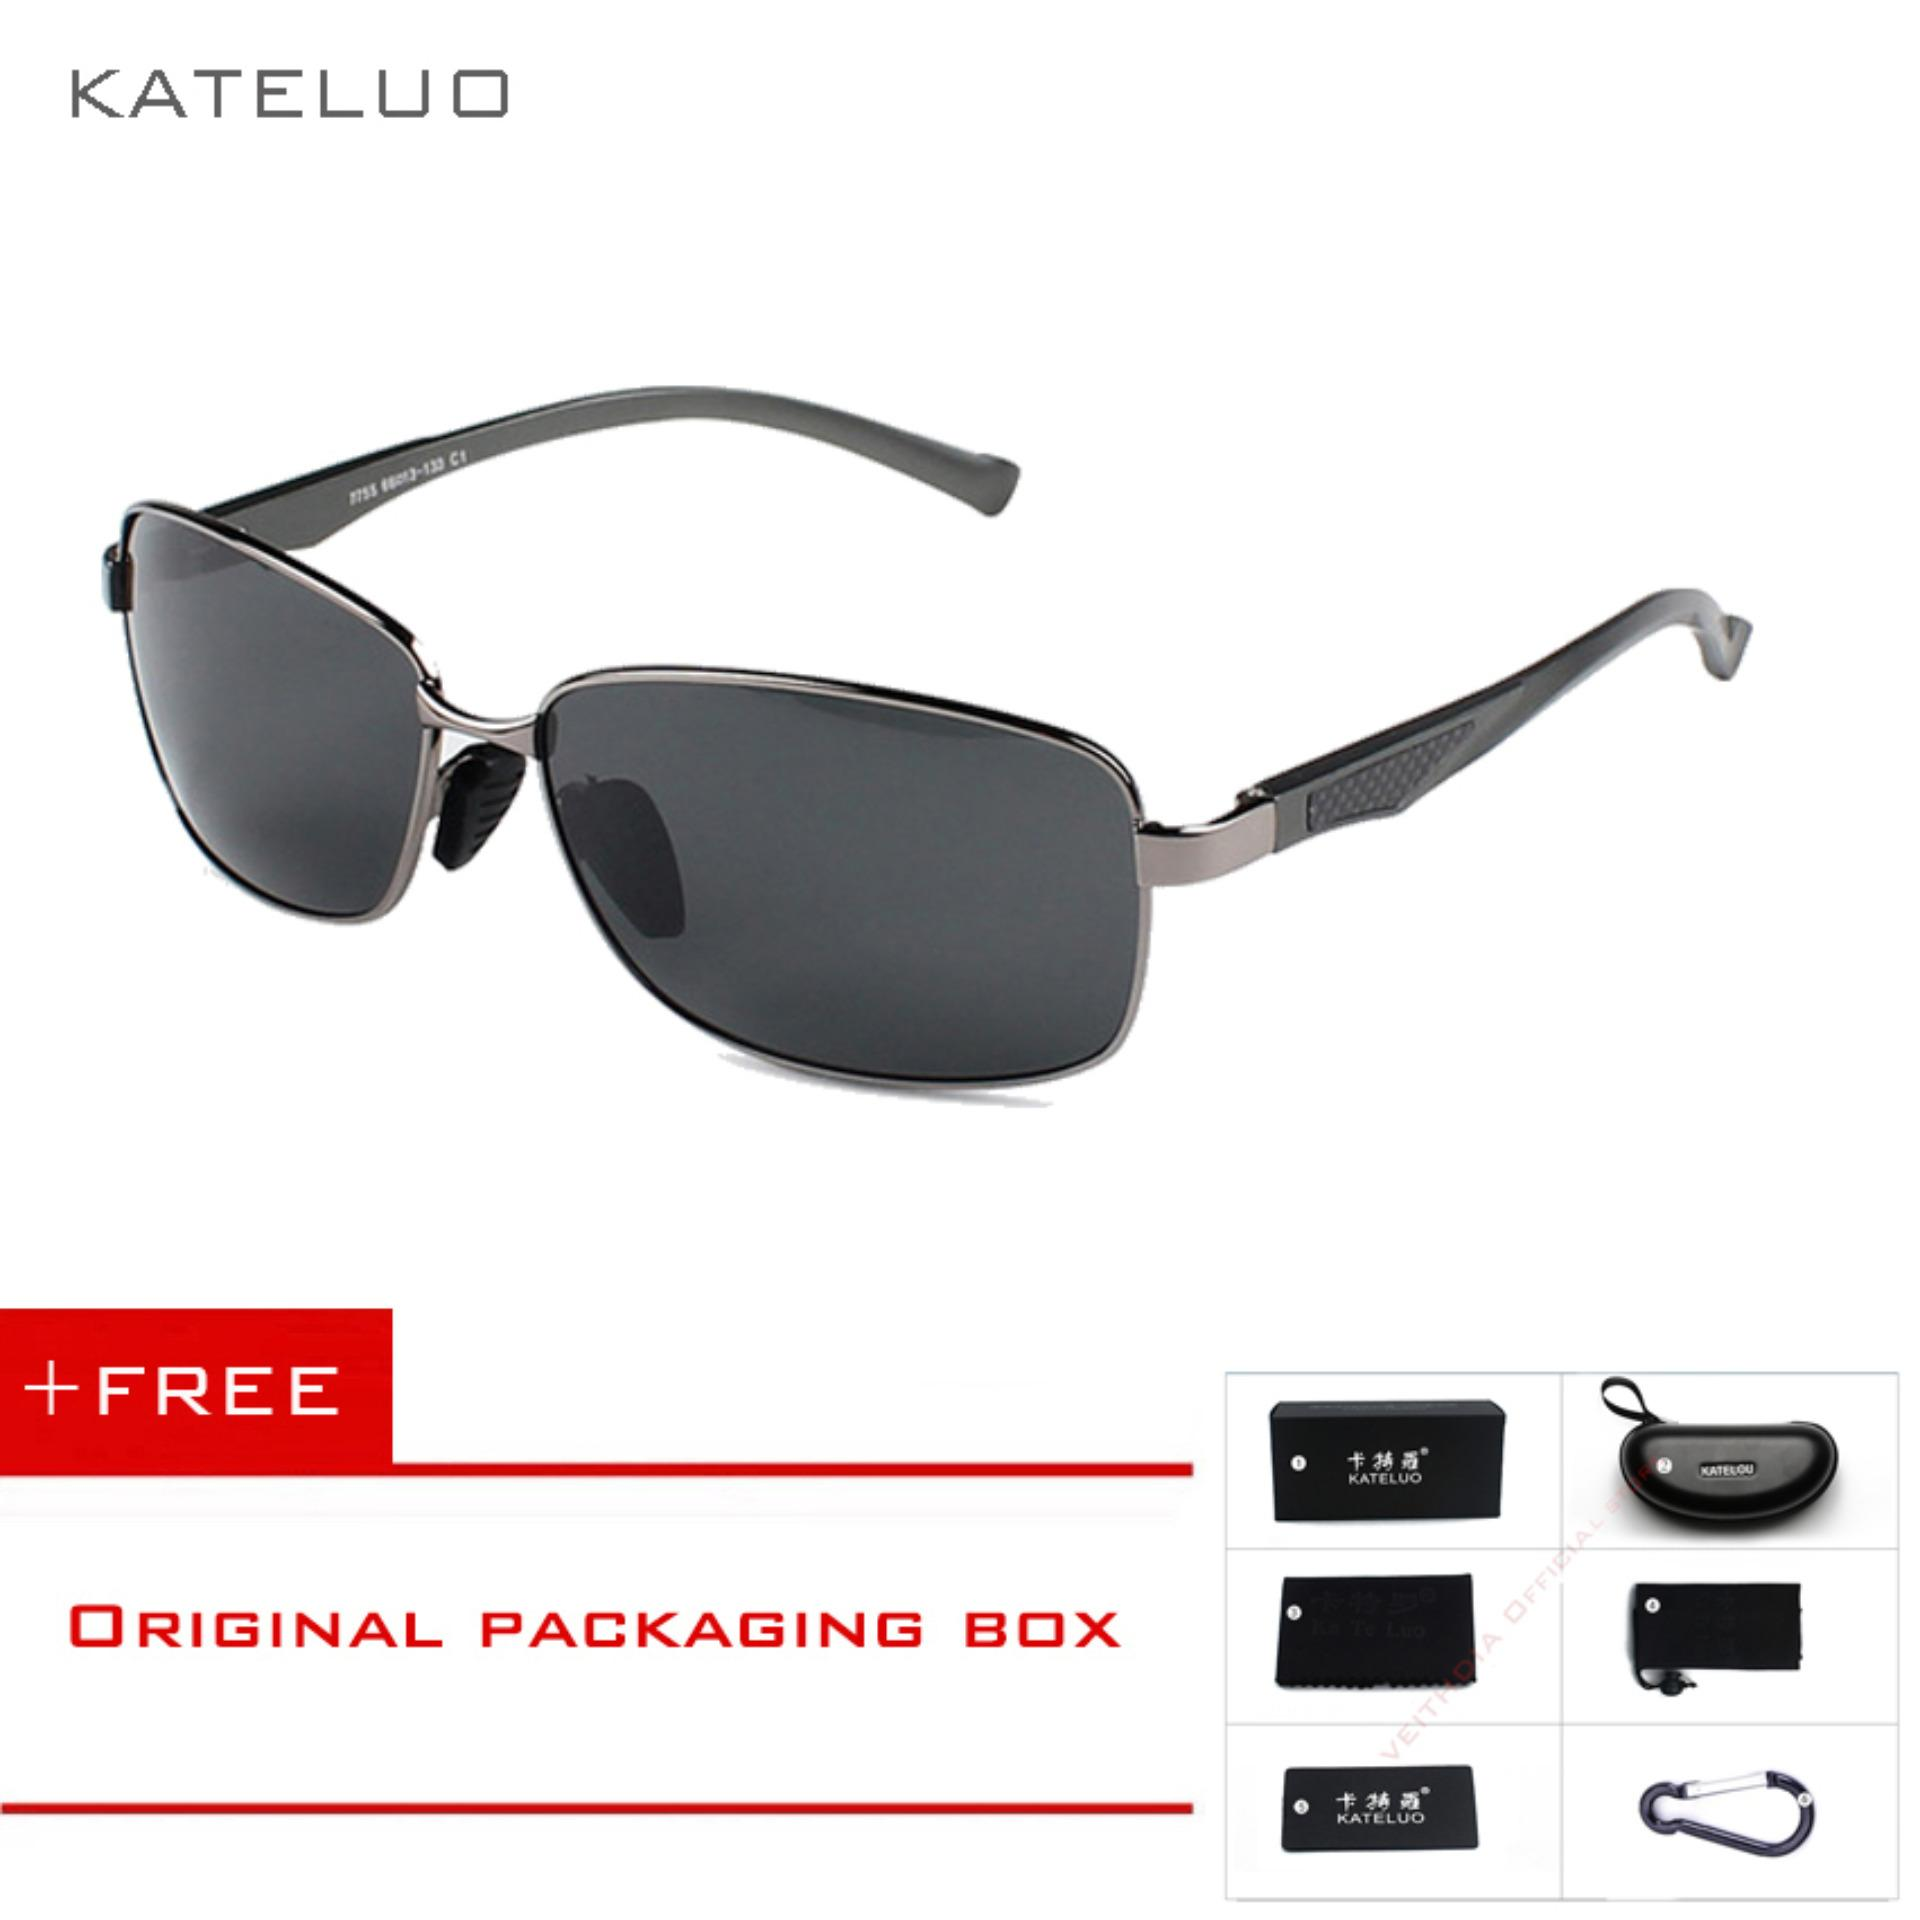 KATELUO Aluminium Magnesium Alloy Men Kacamata Terpolarisasi Lensa Driver Cermin Kacamata Pria Memancing Olahraga Luar Ruangan